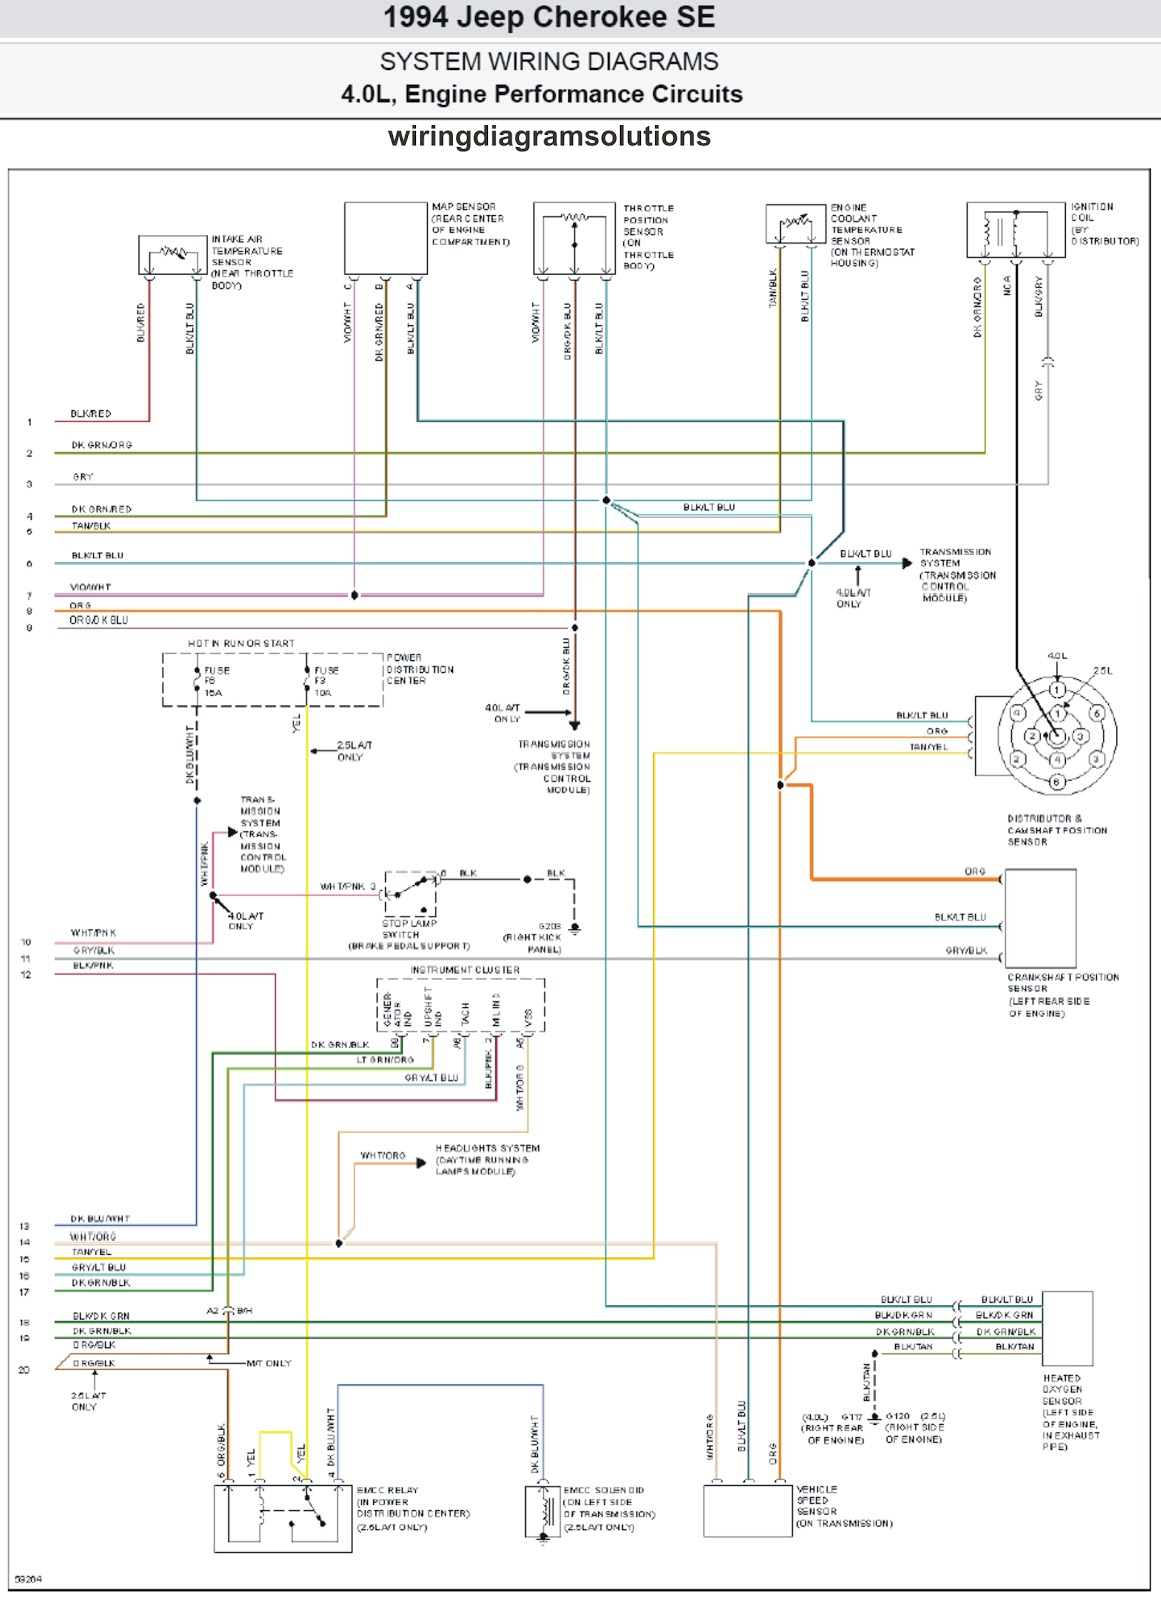 Diagram Wiring Diagram For 1994 Jeep Cherokee Full Version Hd Quality Jeep Cherokee Cinchdiagrams Portoturisticodilovere It